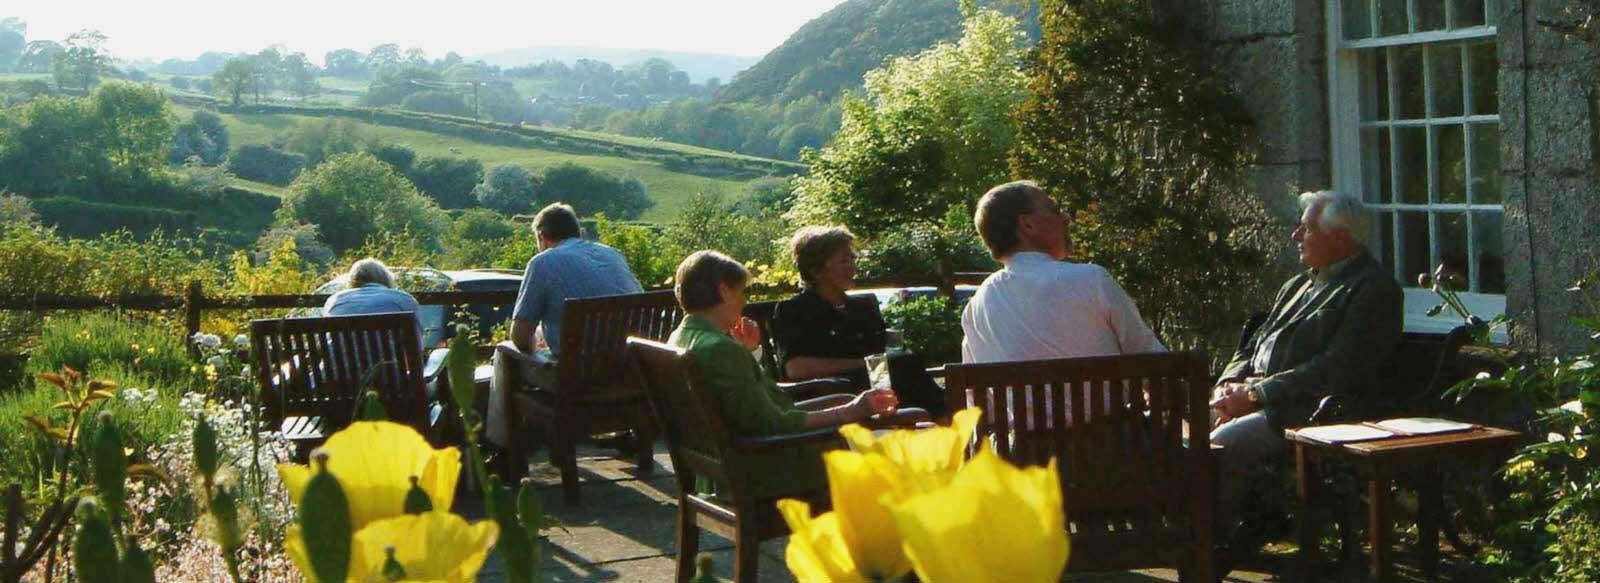 Hotel gardens in Welsh Borders